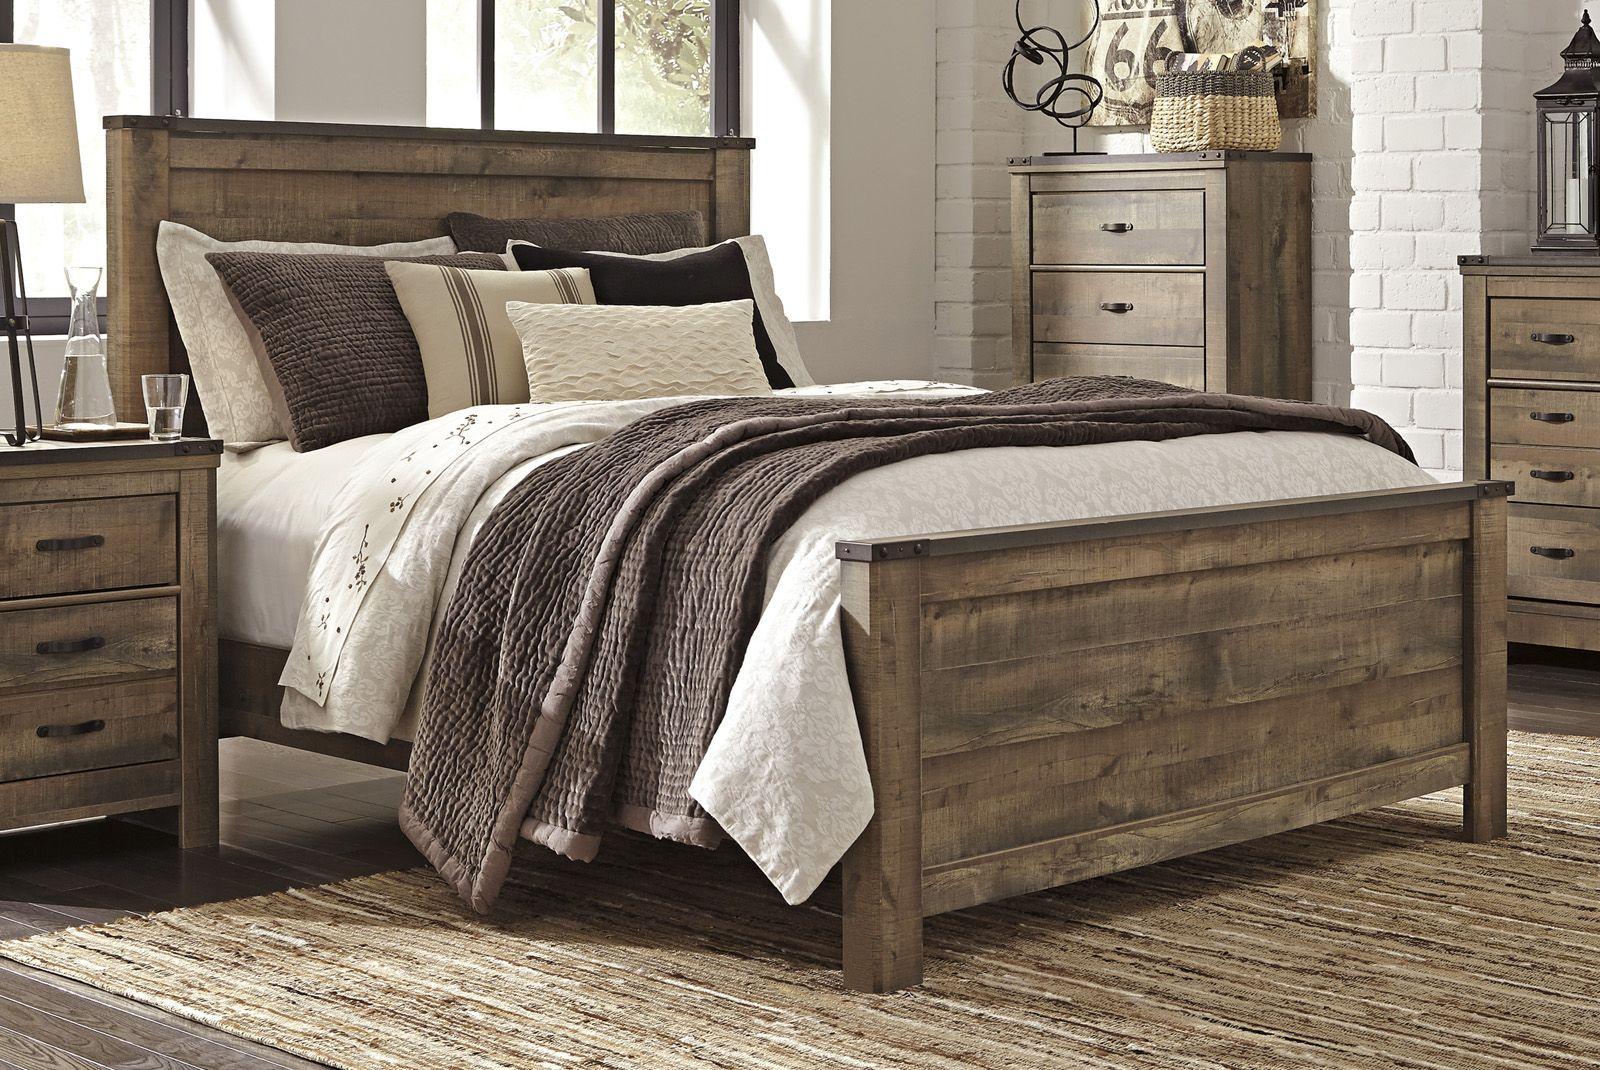 Trinell Queen Panel Bed In Warm Rustic Oak B446 Queen Clearance King Bedroom Sets Wood Bedroom Sets Rustic Bedroom Furniture